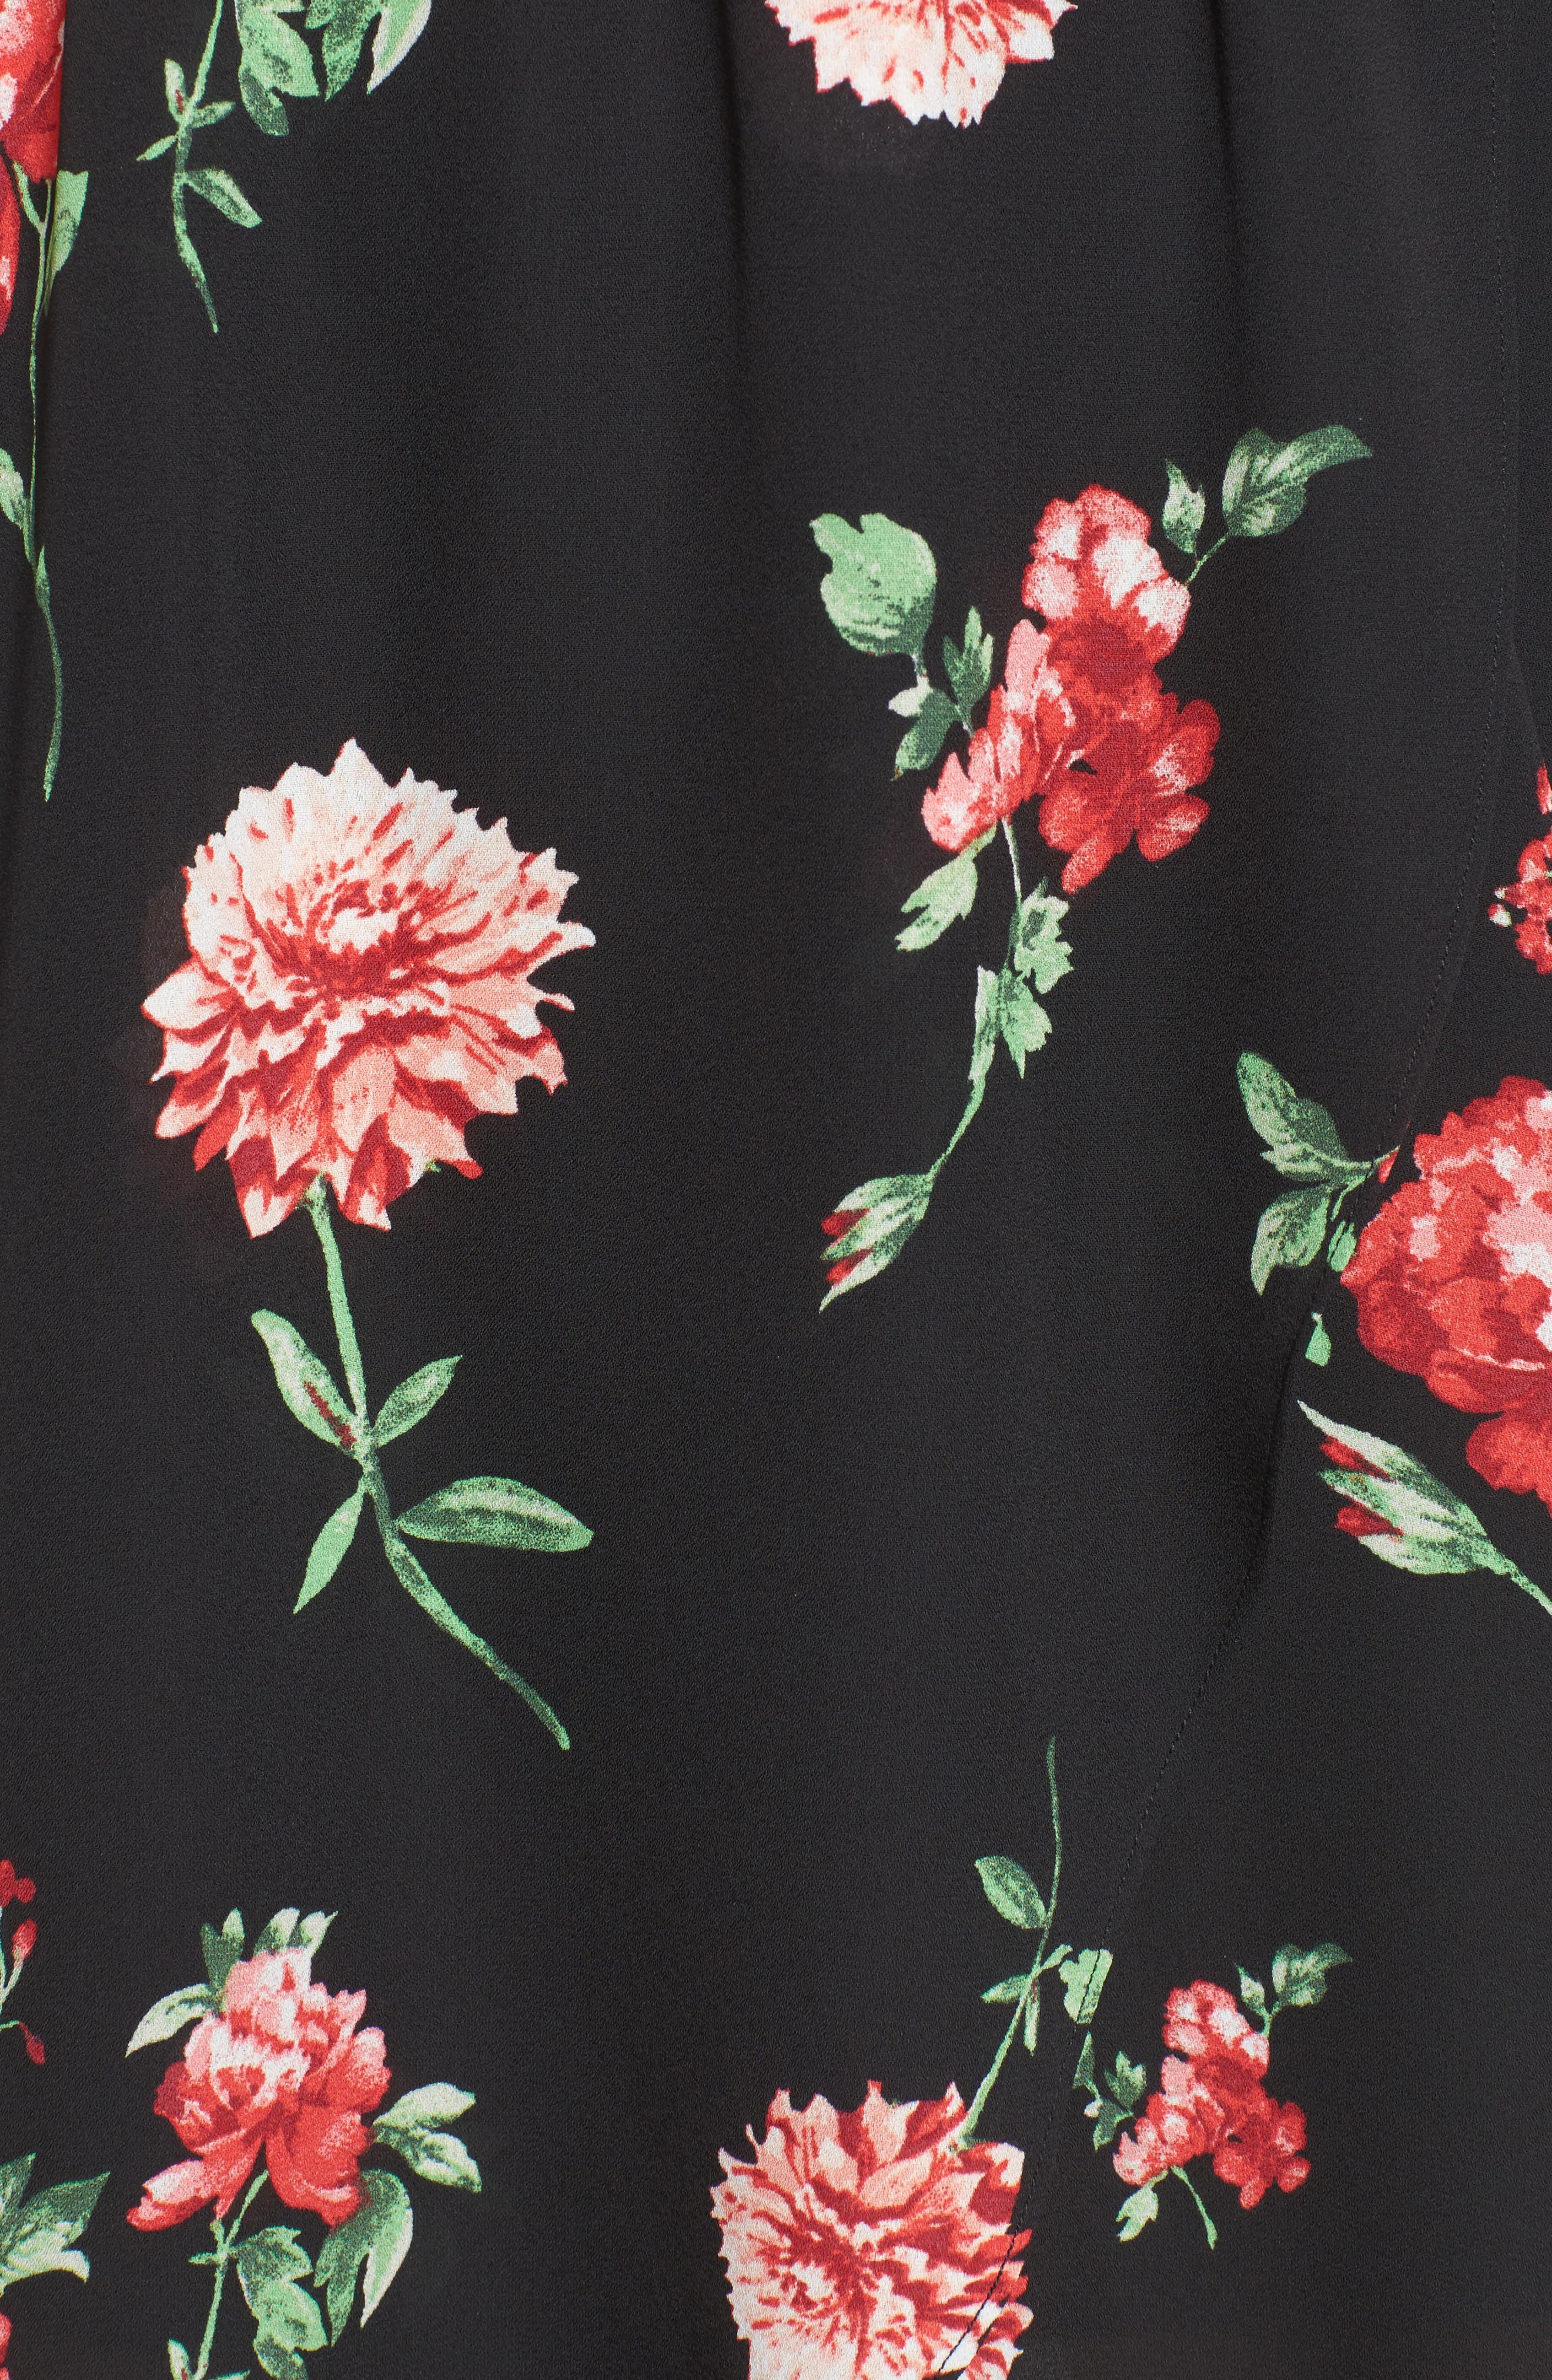 Ruffle Cold Shoulder Faux Wrap Dress,                             Alternate thumbnail 5, color,                             750 Black Red